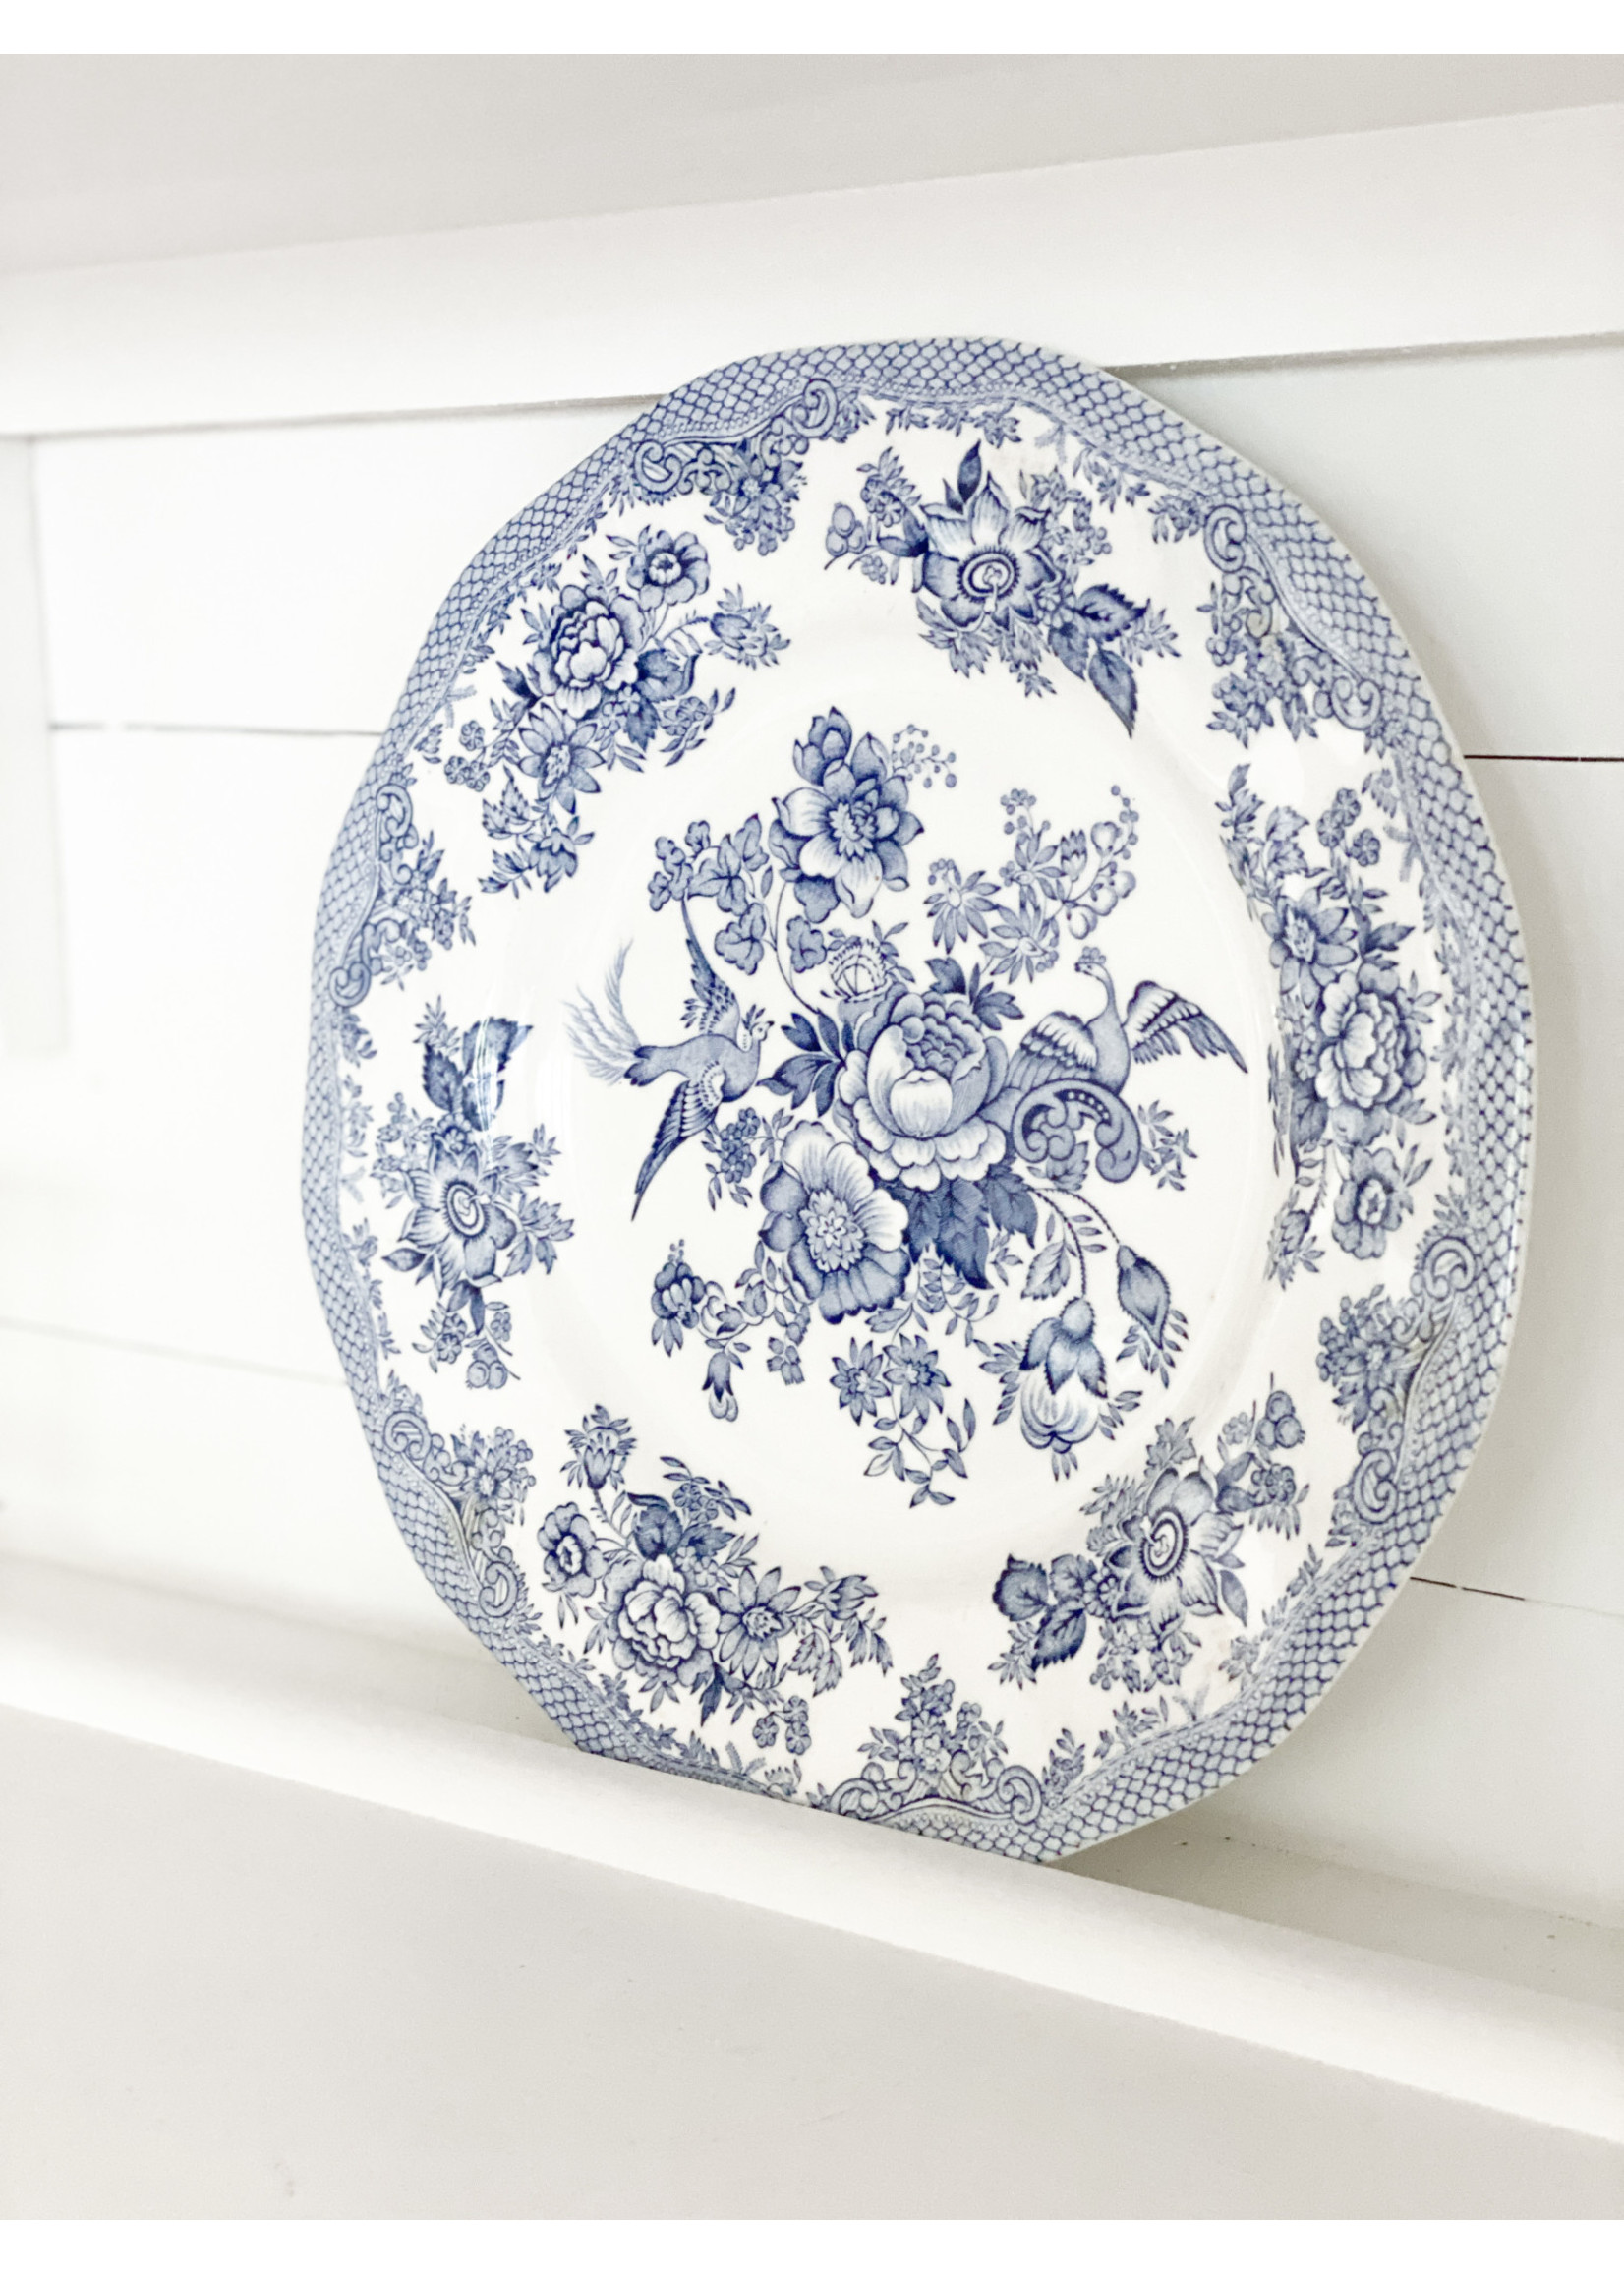 Antique Asiatic Pheasants Blue & White Plate